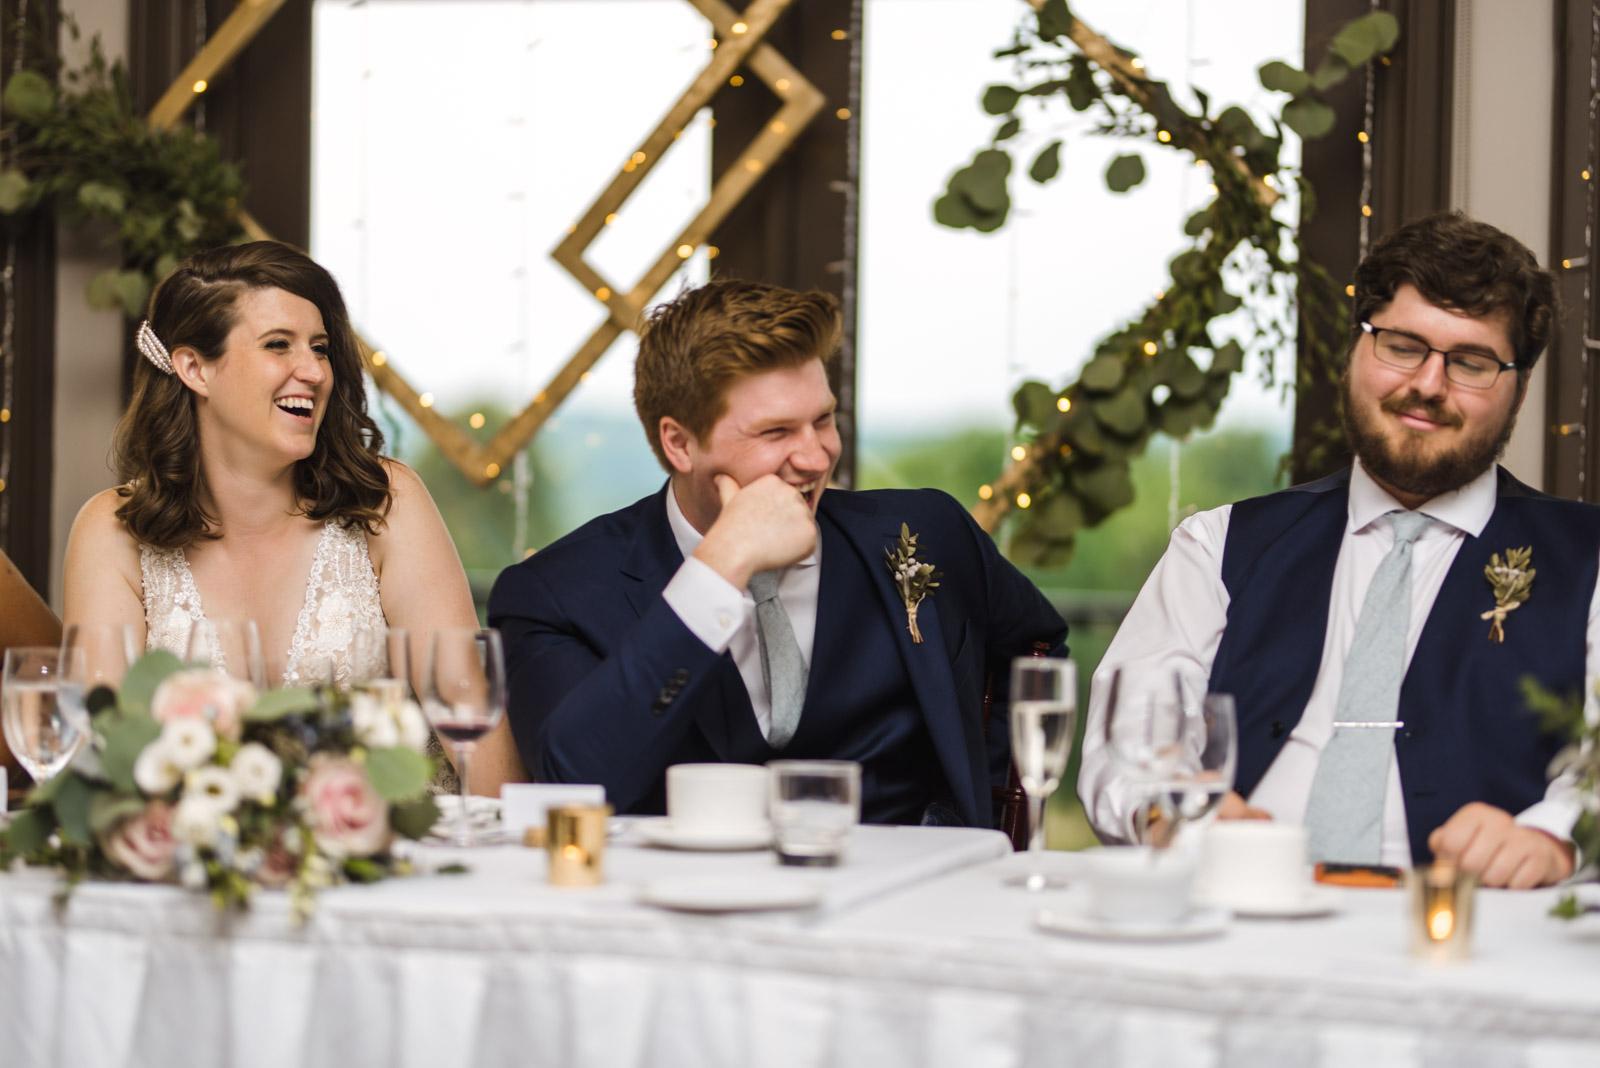 Emerson & Elicia's Golf Course Wedding Aidan & Leanne Hennebry Hamilton Wedding Videographers Photographers Niagara Hush Hush Photography & Film-67.jpg